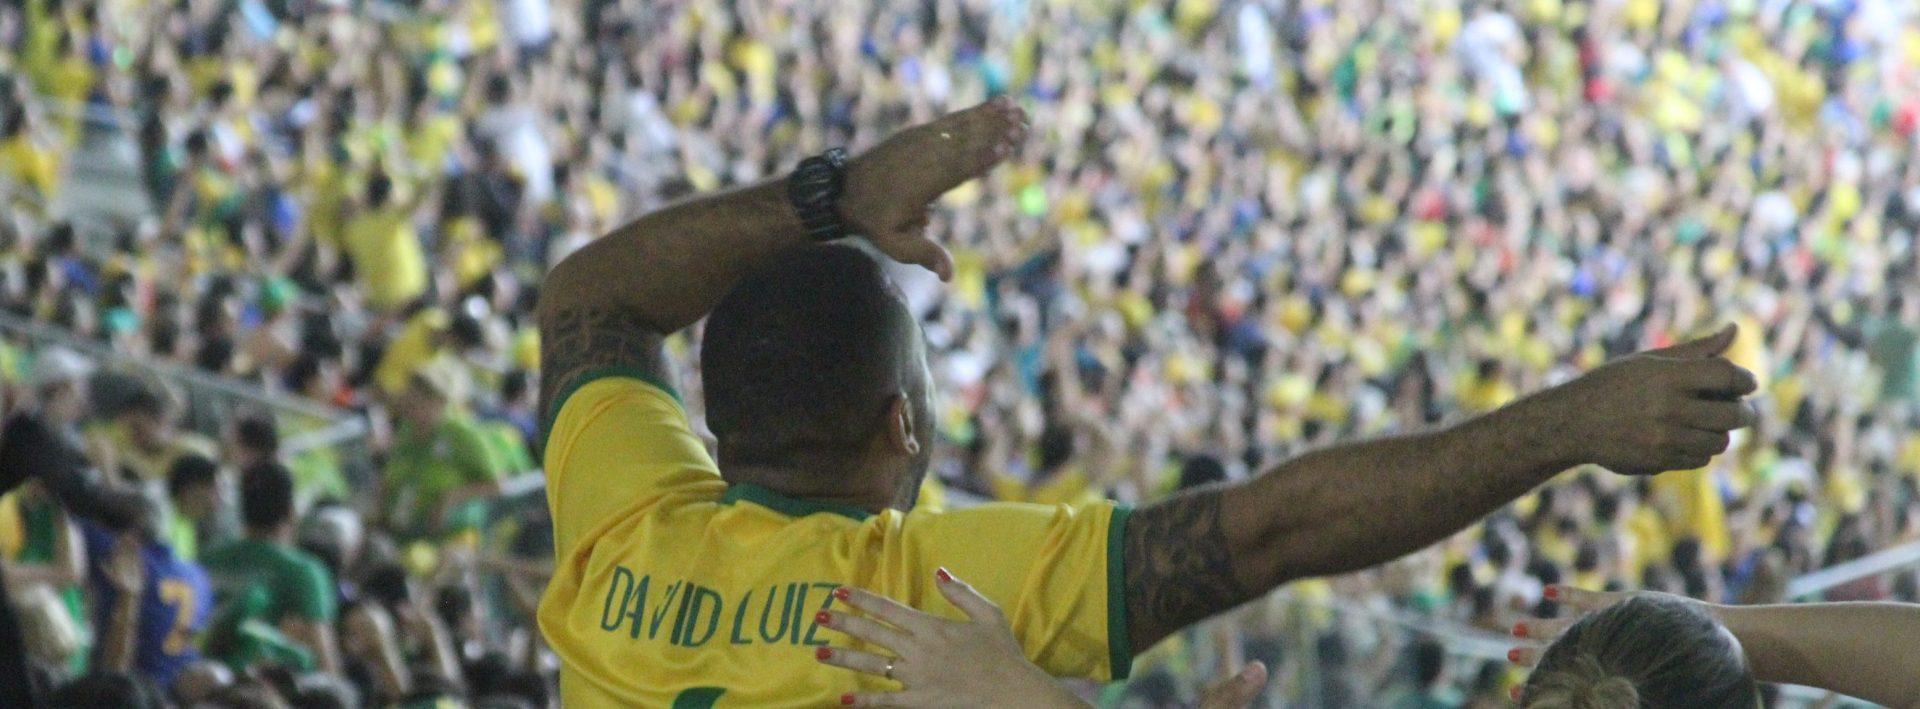 brazil fan maracana rio 2016